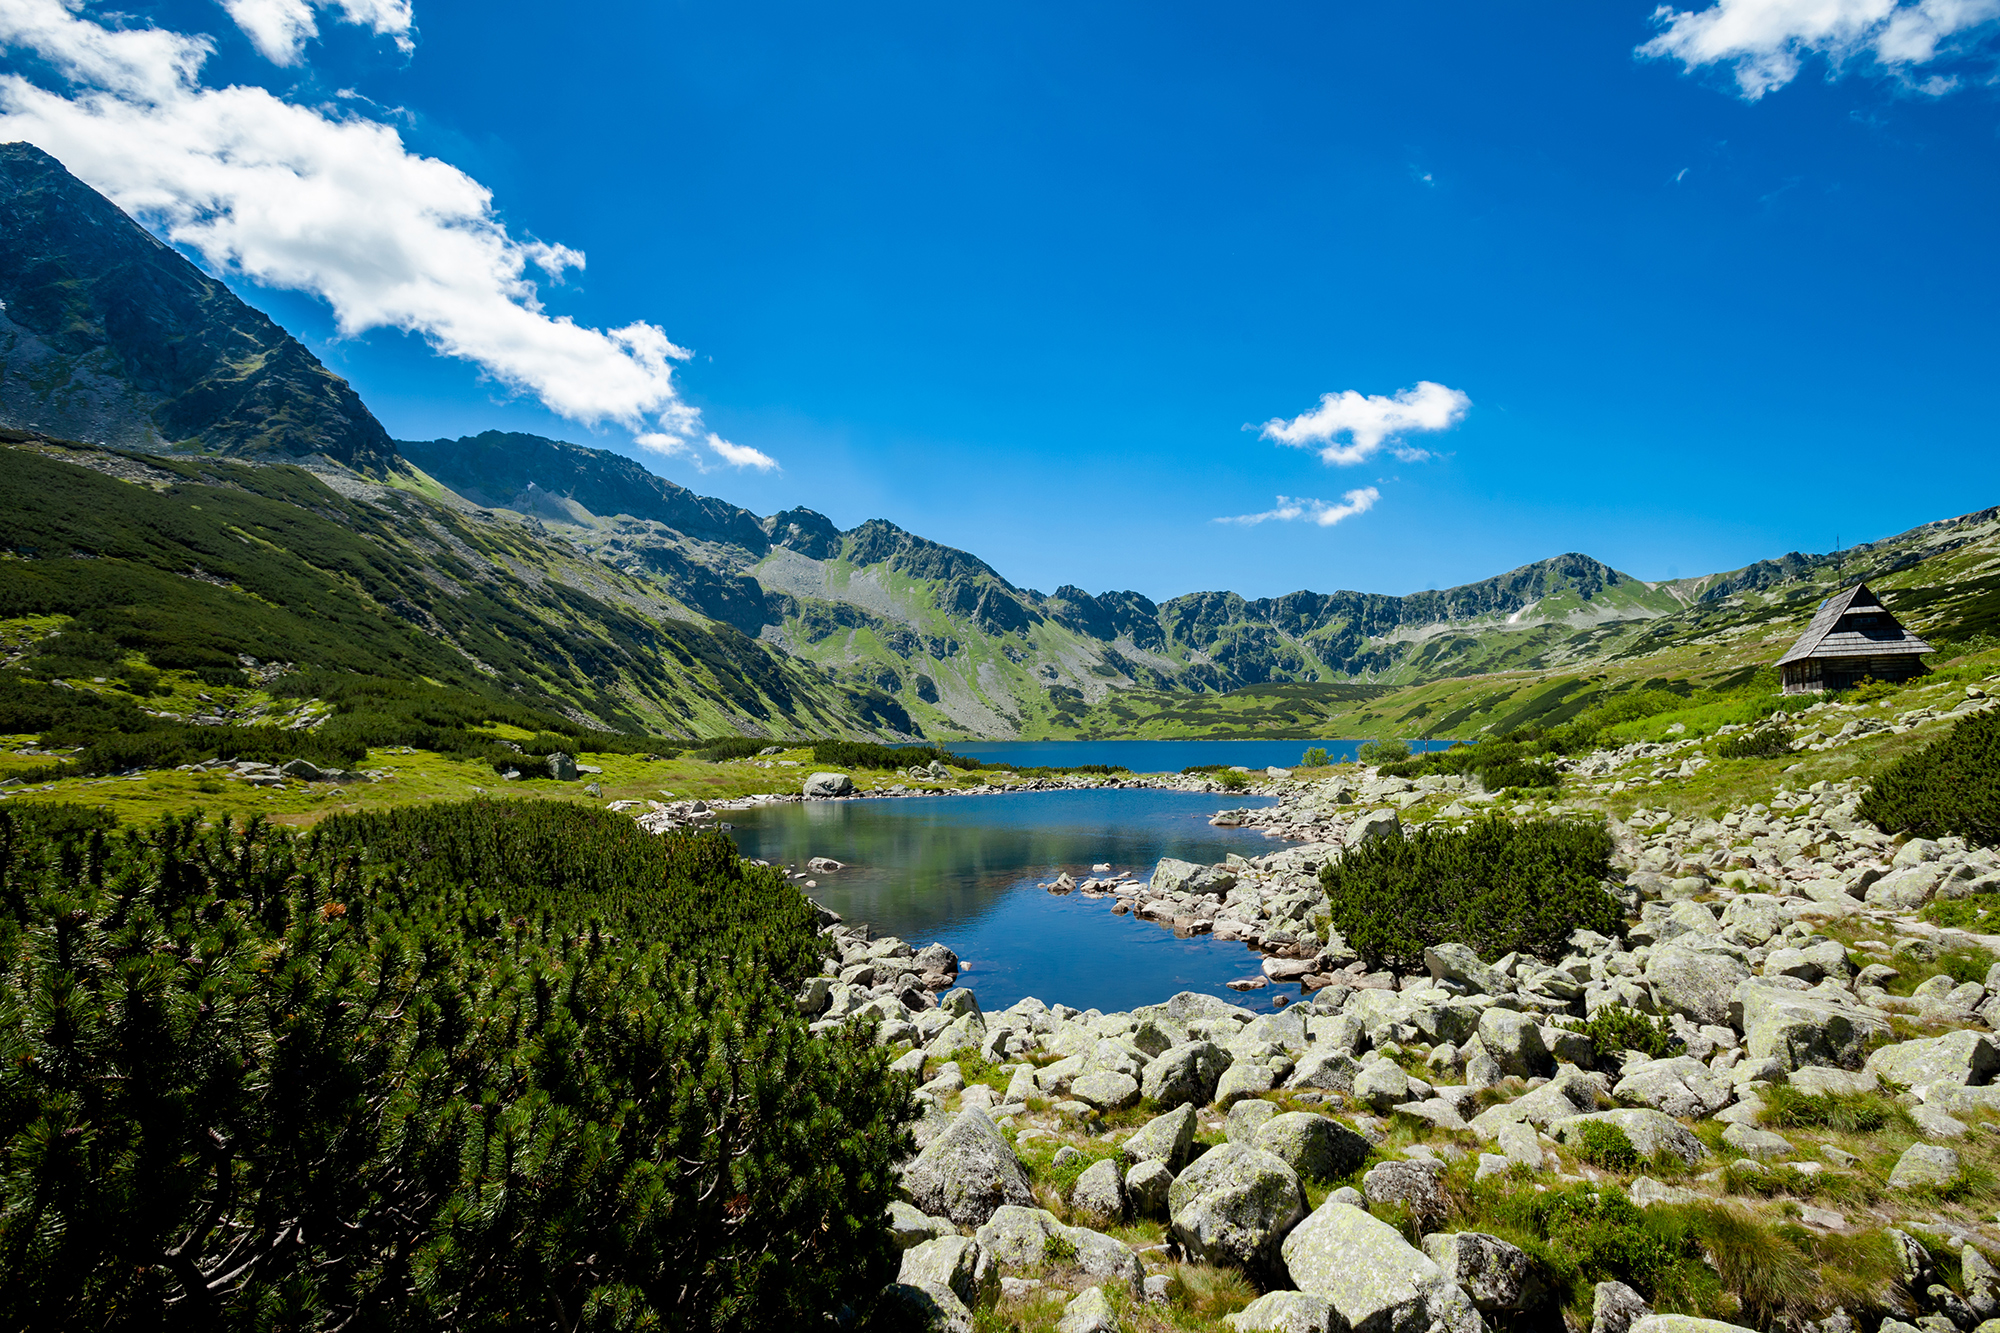 Five lakes valley, Poland